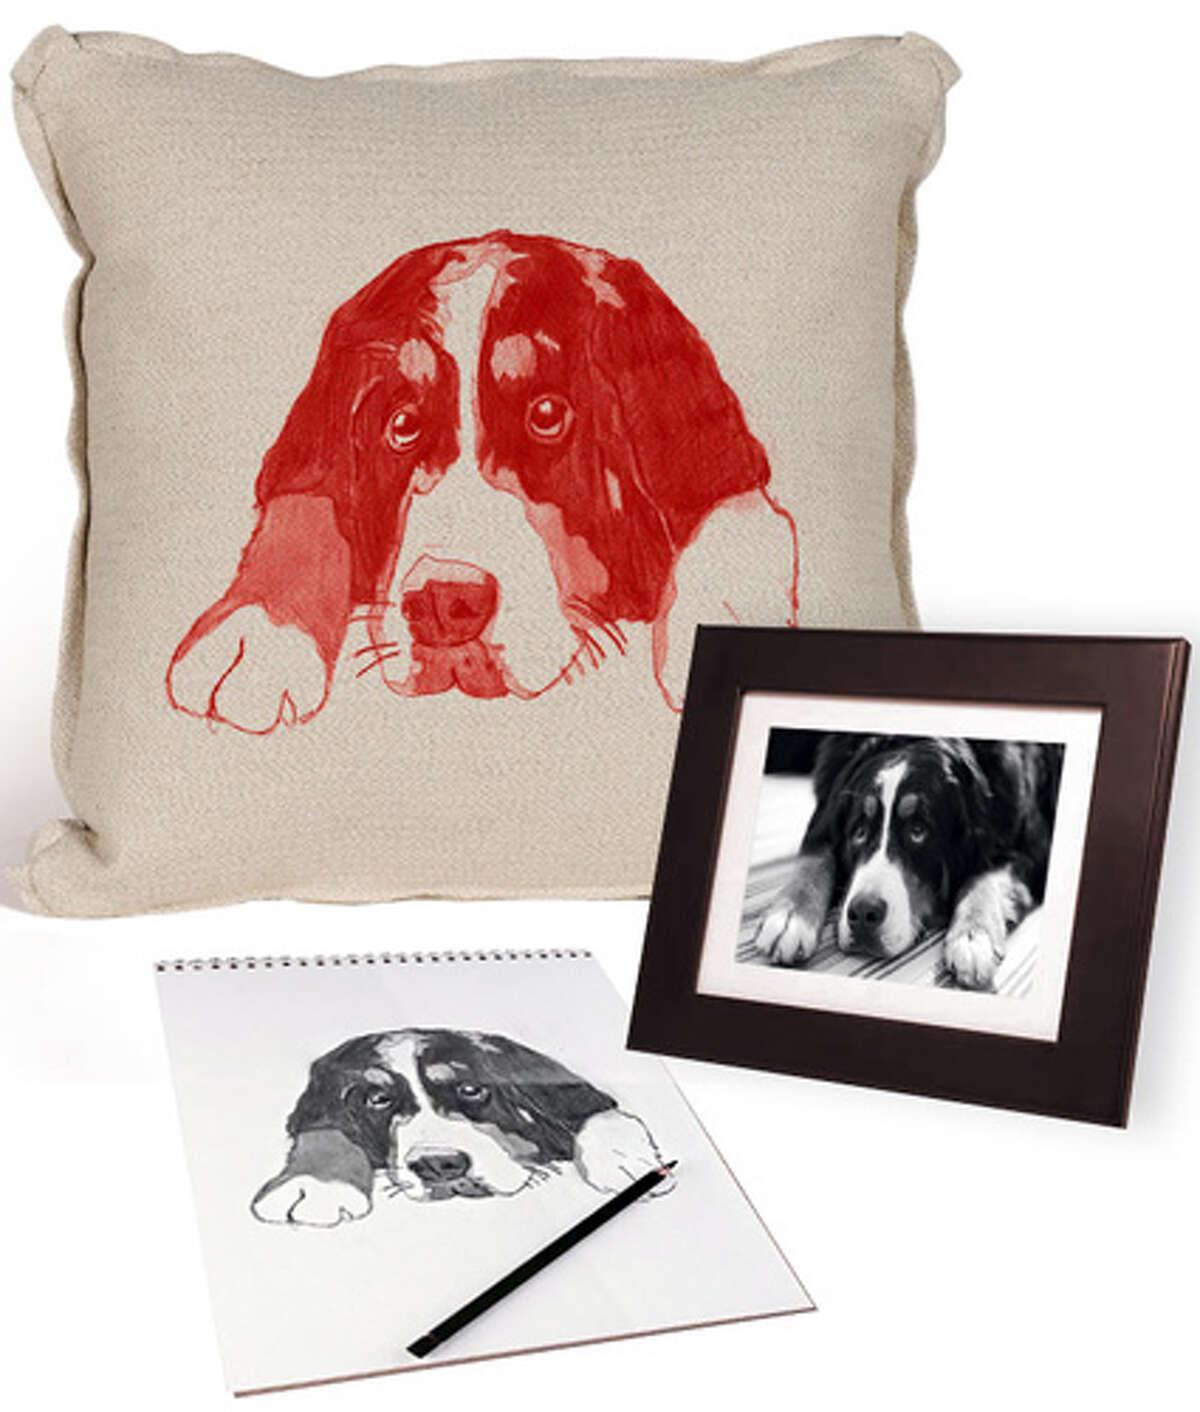 Custom Illustrated Pillow Oprah says: